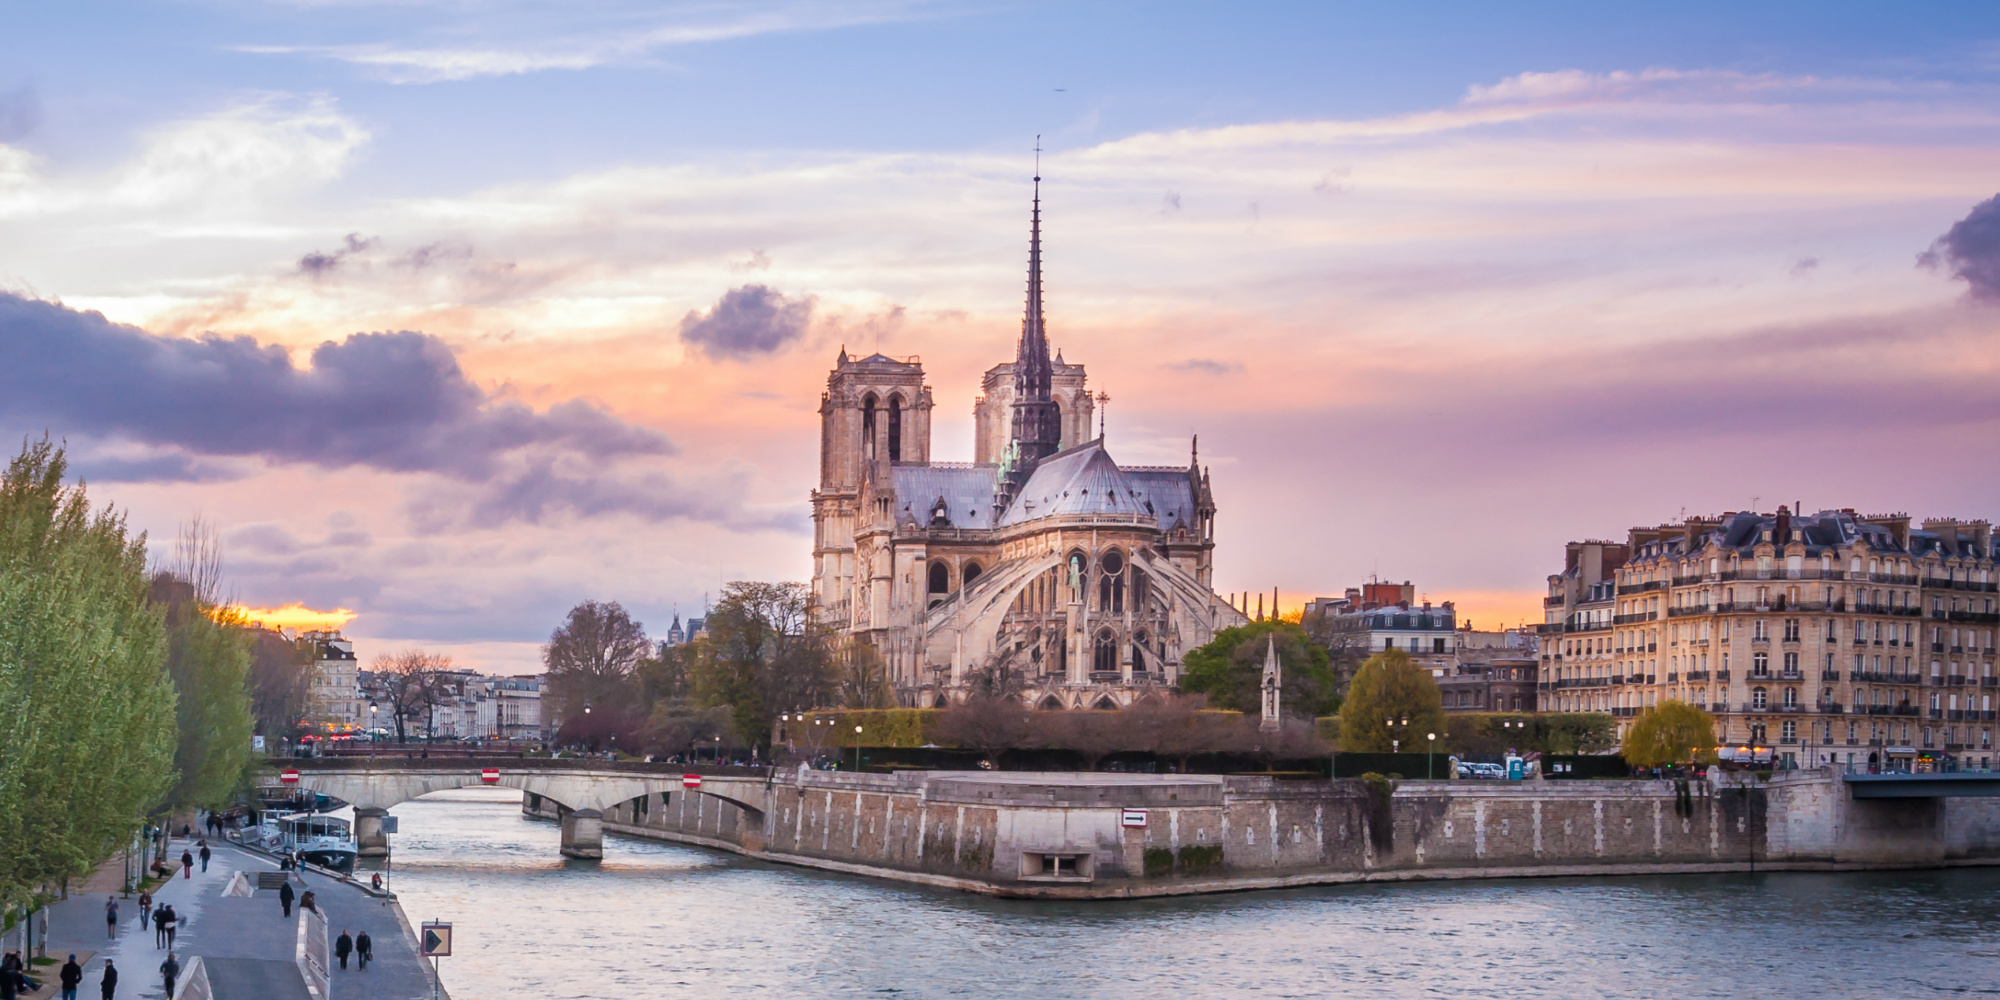 Собор Парижской Богоматери / Нотр-Дам-де-Пари